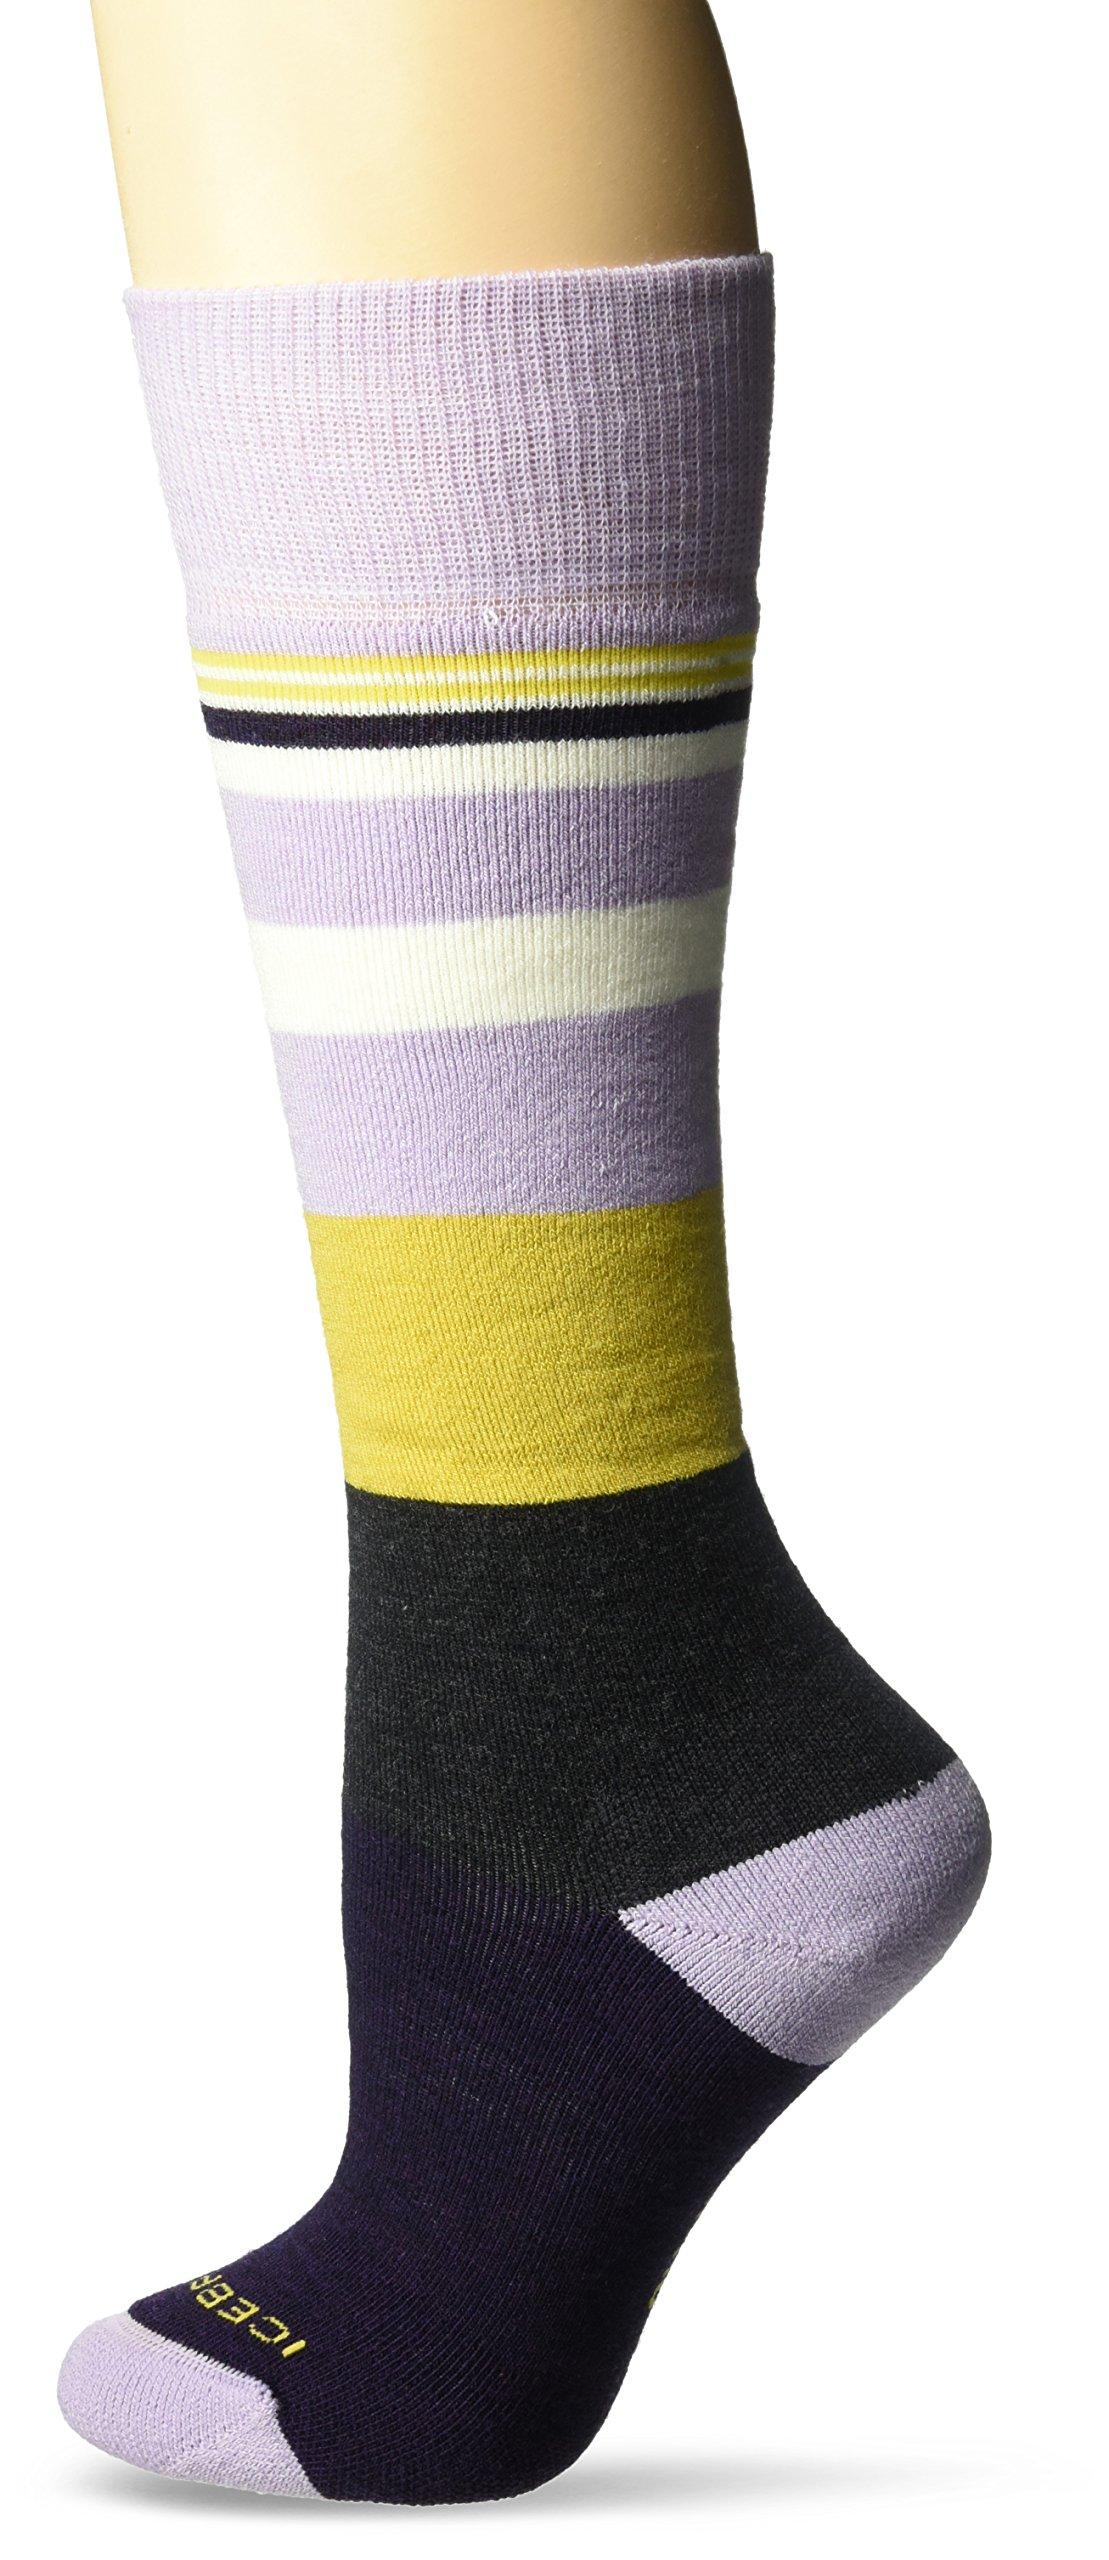 Icebreaker Merino Women's Lifestyle Medium Over The Calf Socks, Silk Heather/Burgundy Heather/Sulfur, Small